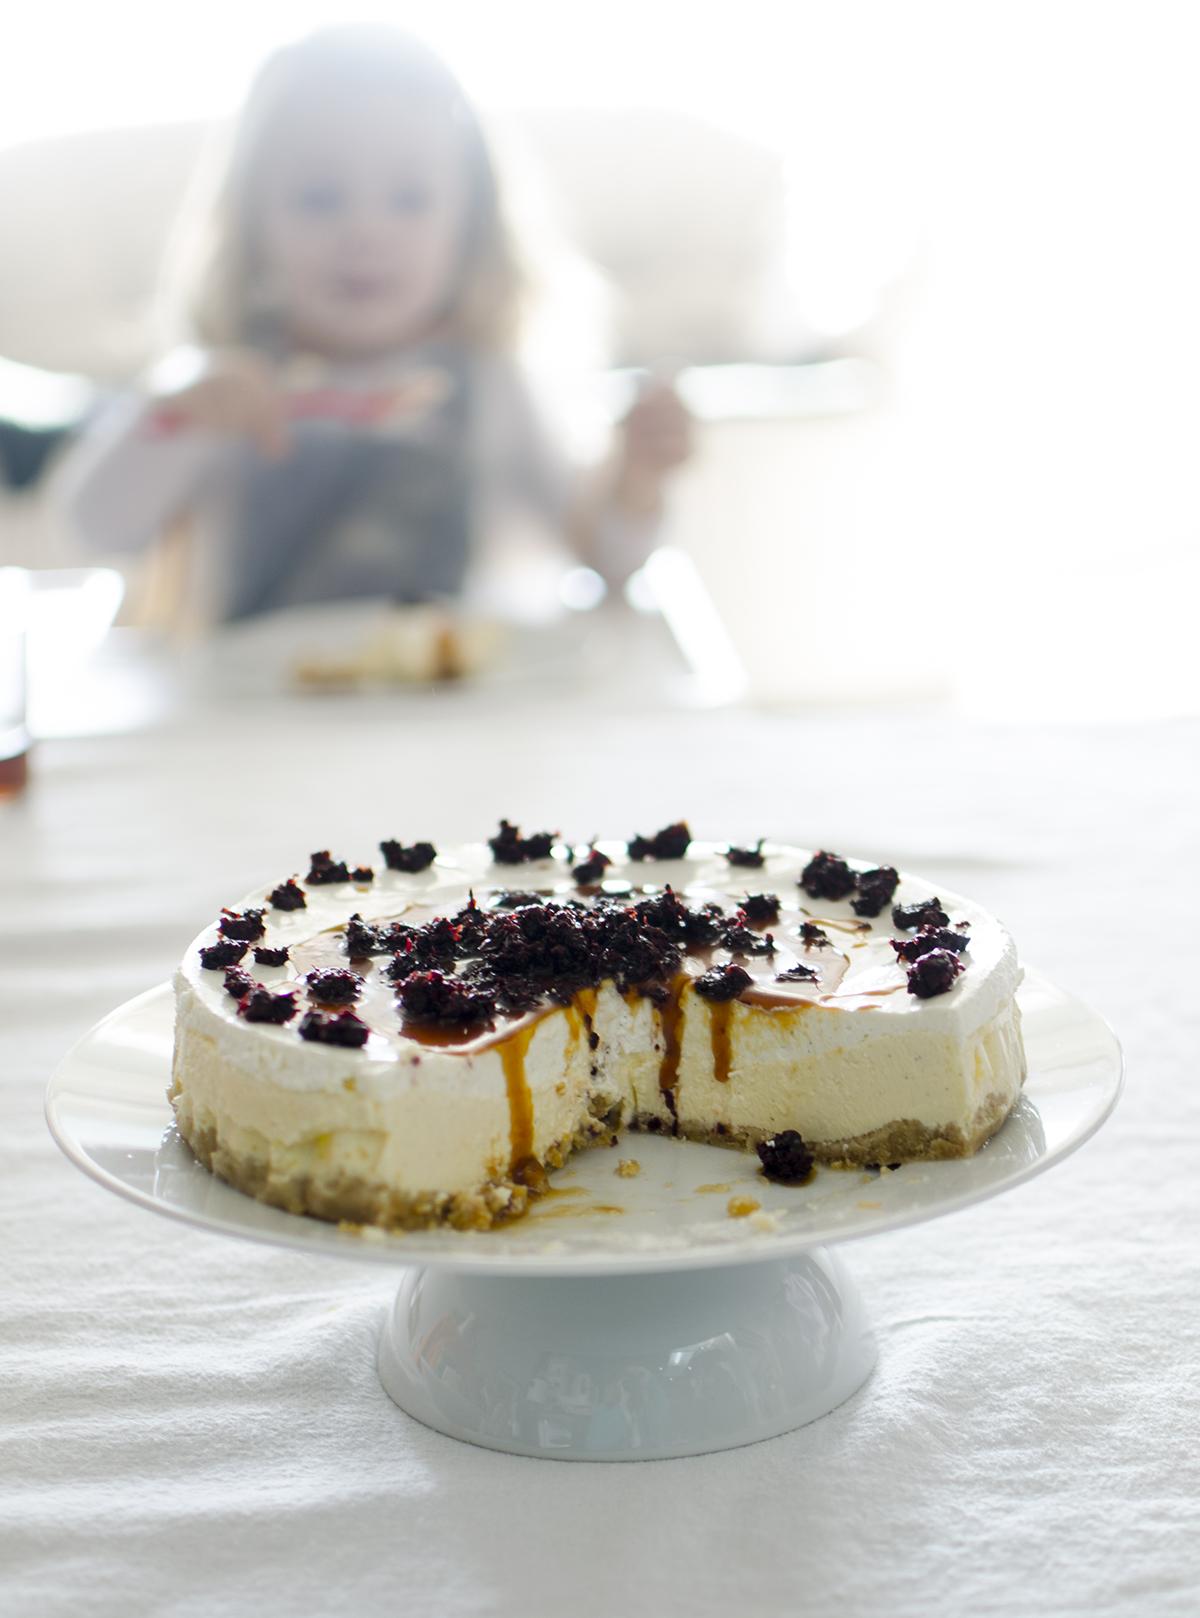 cheesecake_legjobb10.jpg